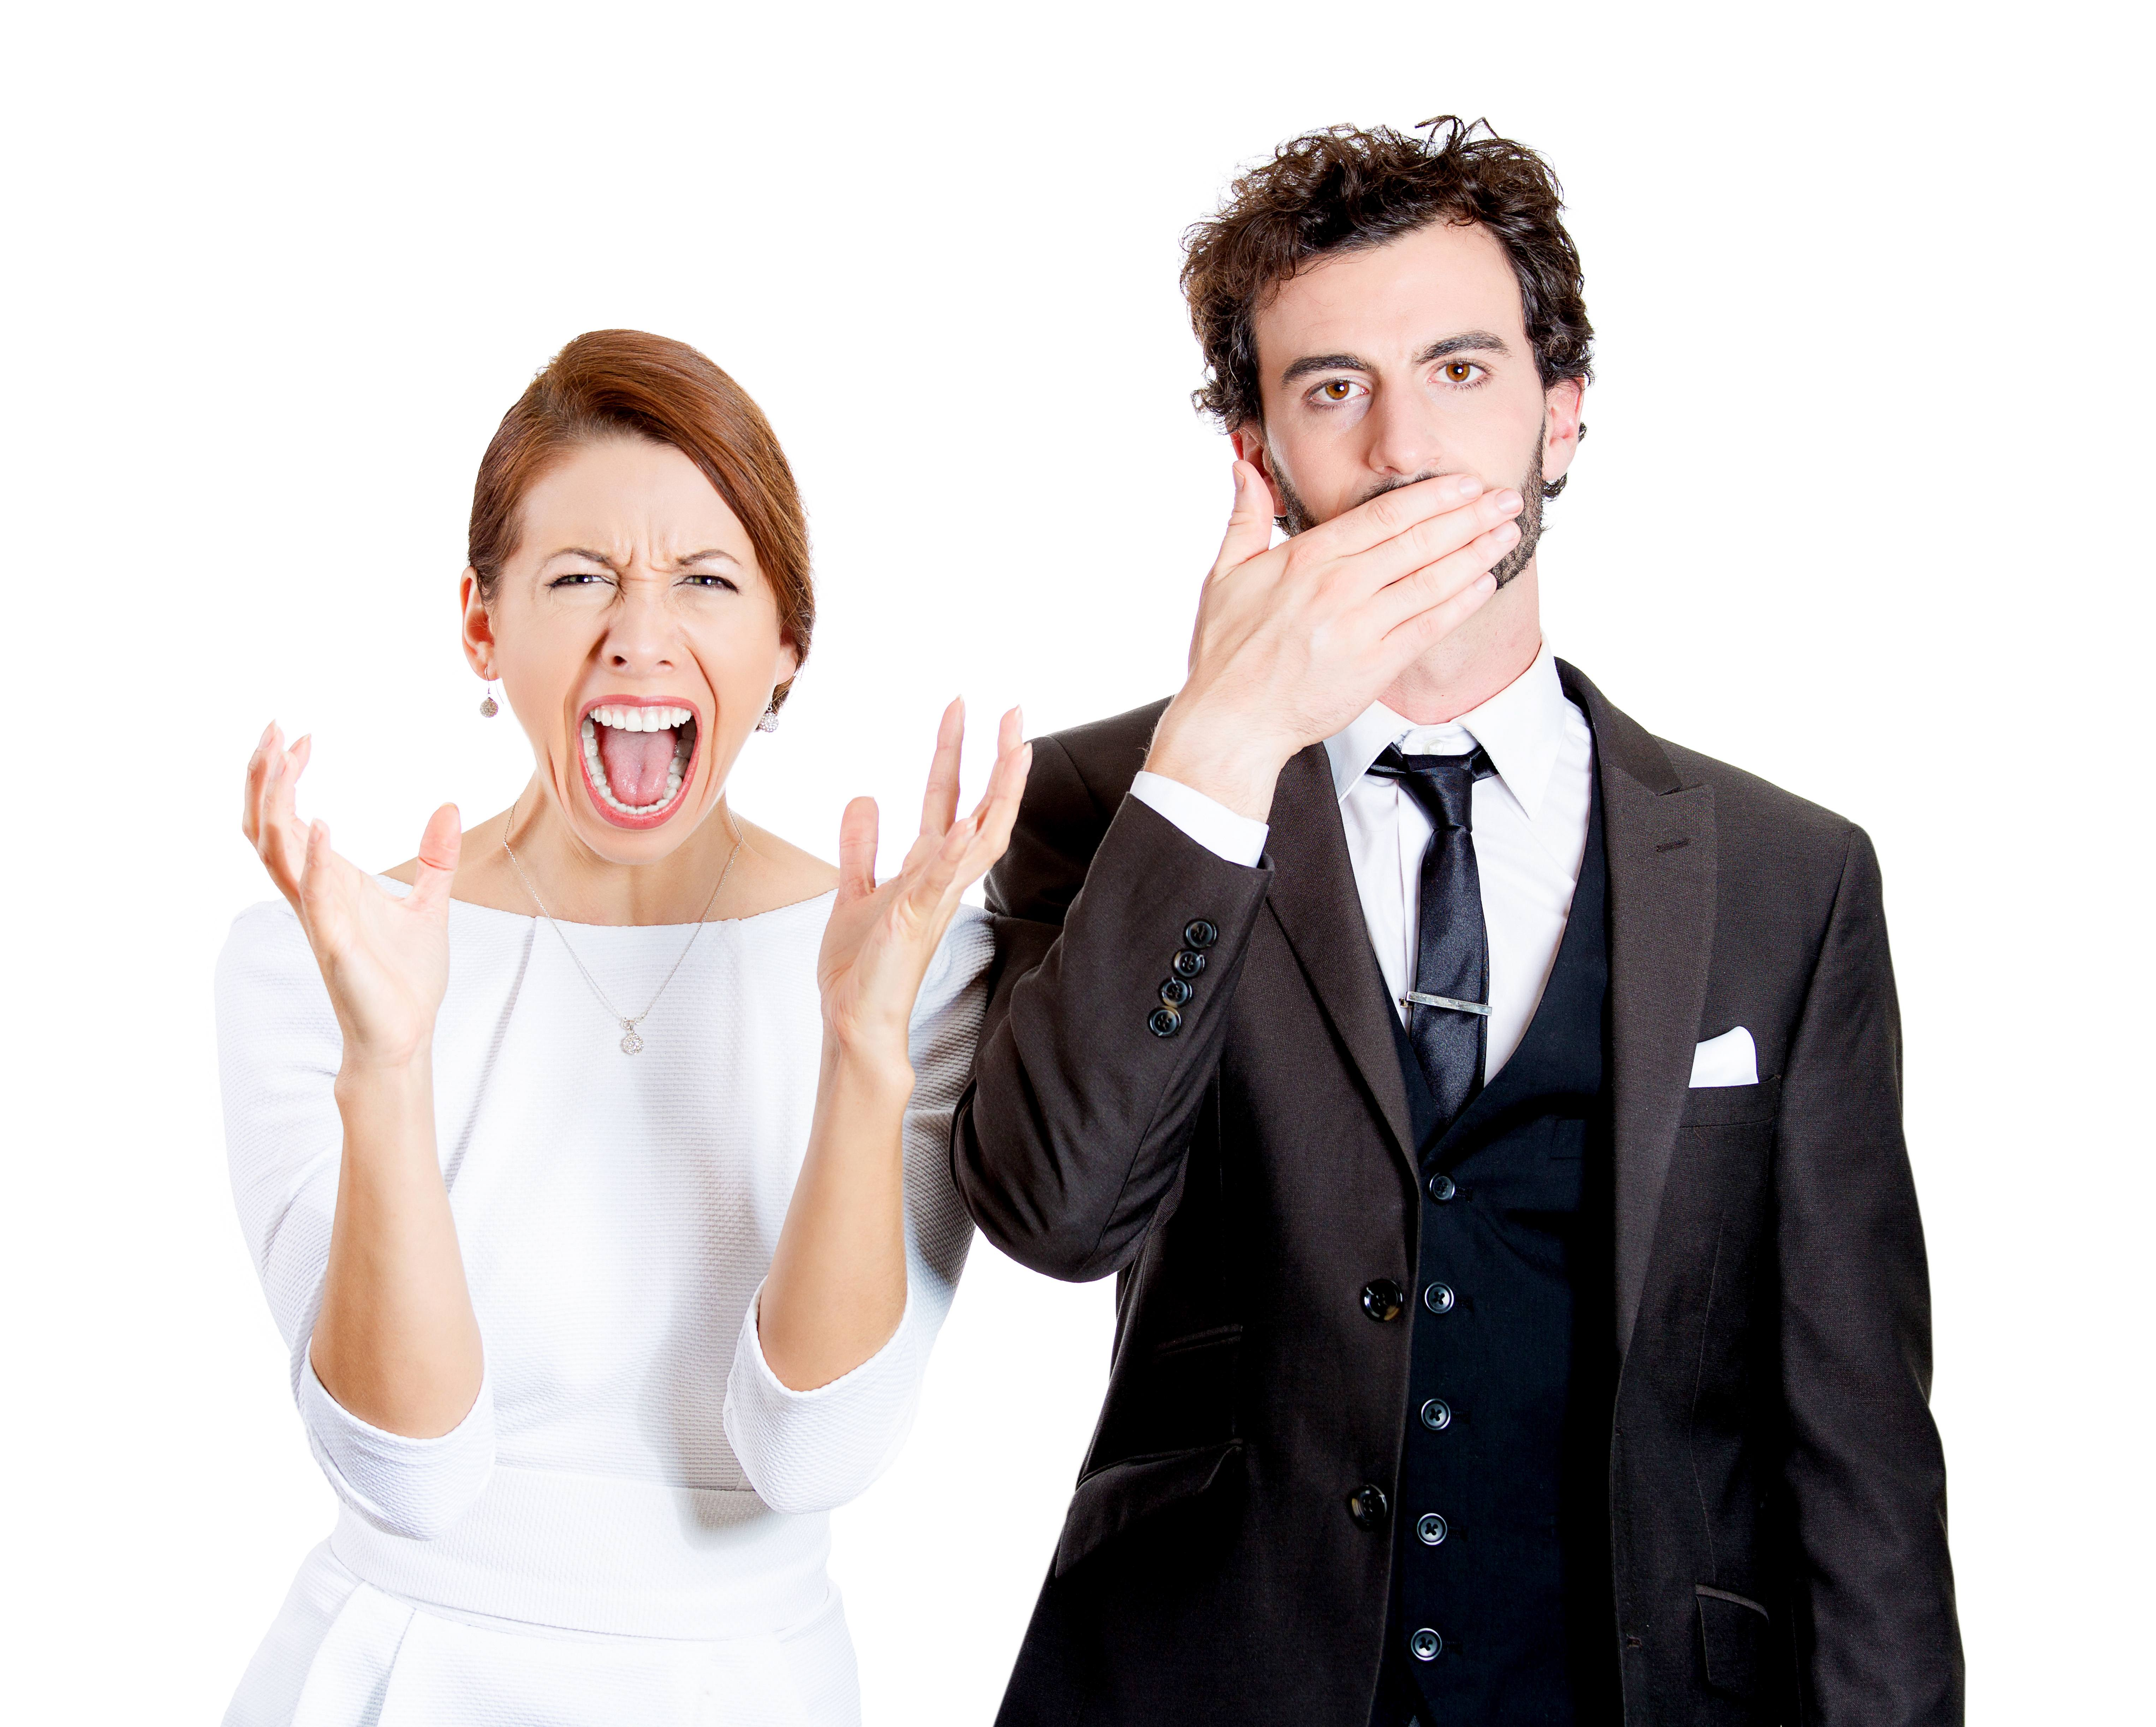 6 WAYS TO NAVIGATE DIFFICULT CONVERSATIONS